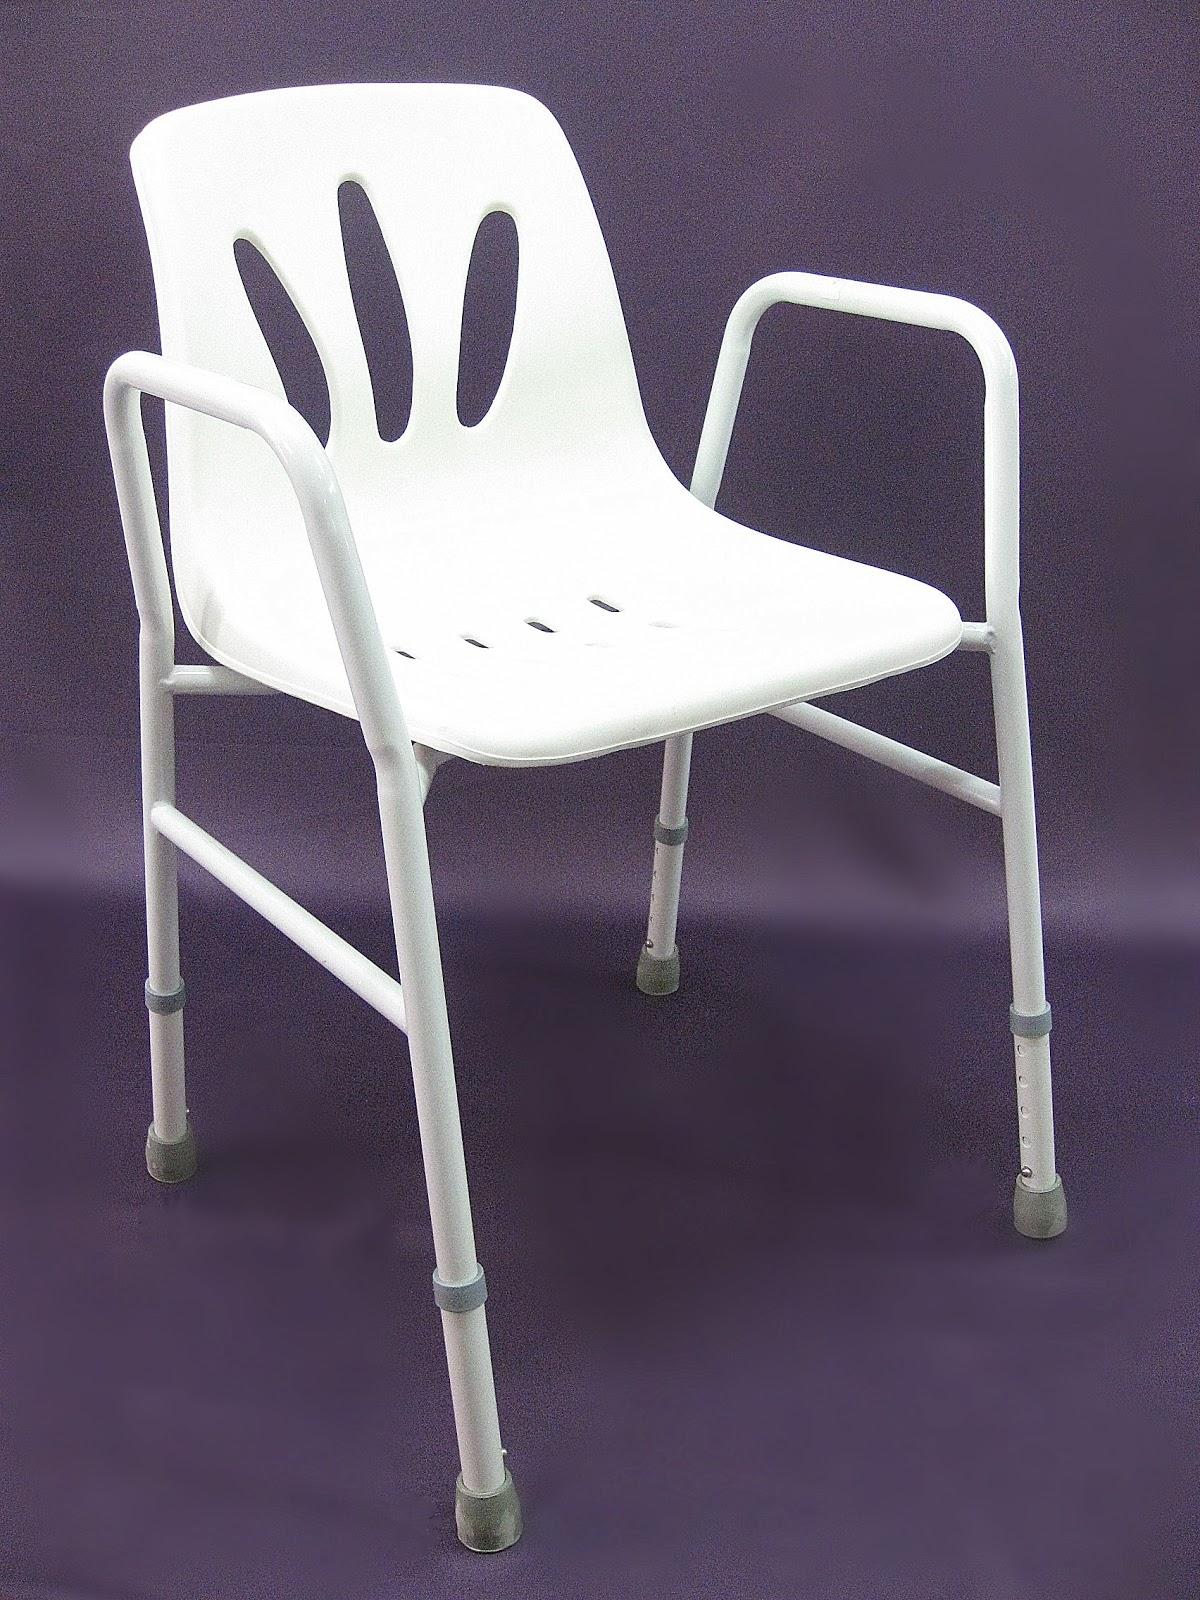 shower chair malaysia walmart computer desk chairs kerusi mandi for homecare rumah orang tua